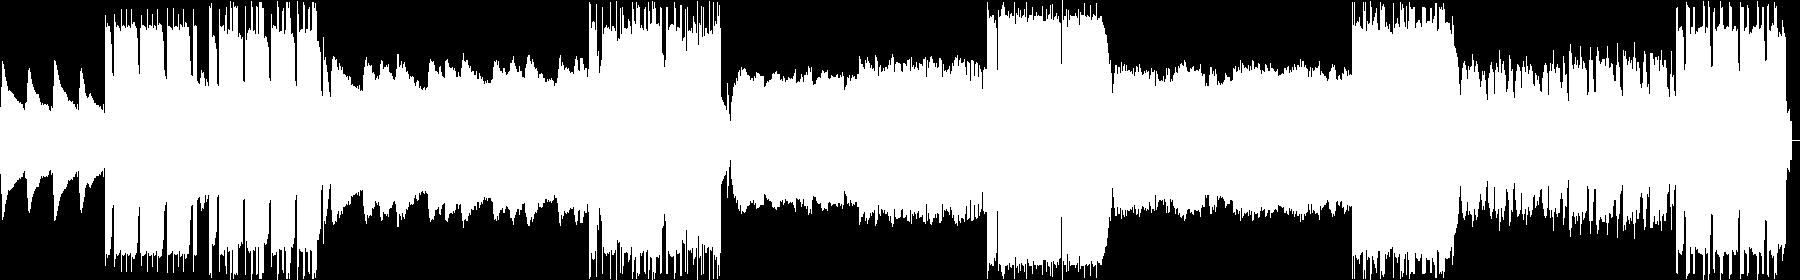 Modern Cthulhu 2 - Presets + BONUS audio waveform